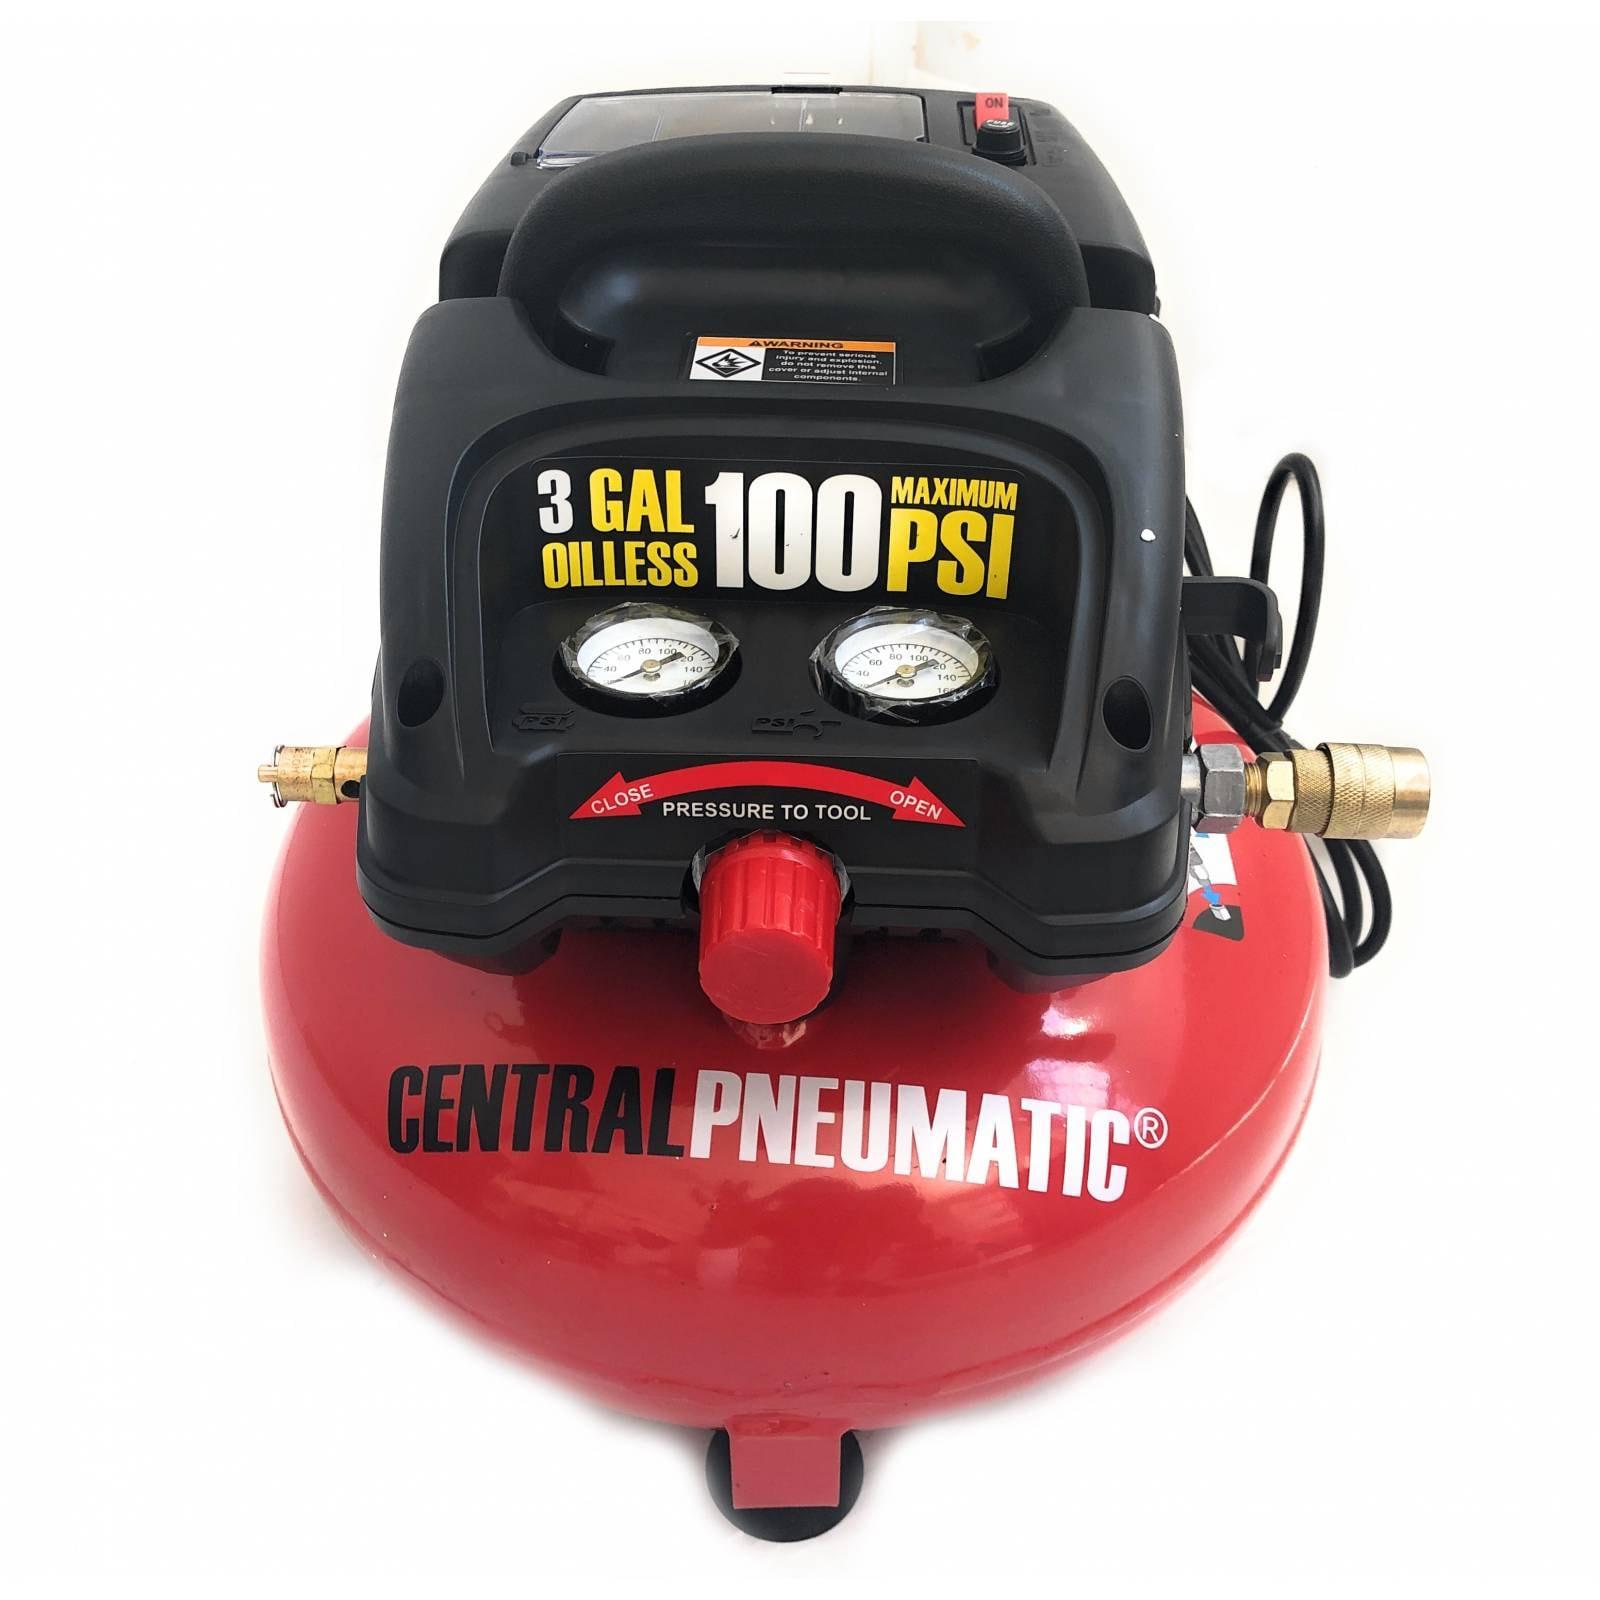 Compresor Pancake 3 Galones 100 Psi Central Pneumatic